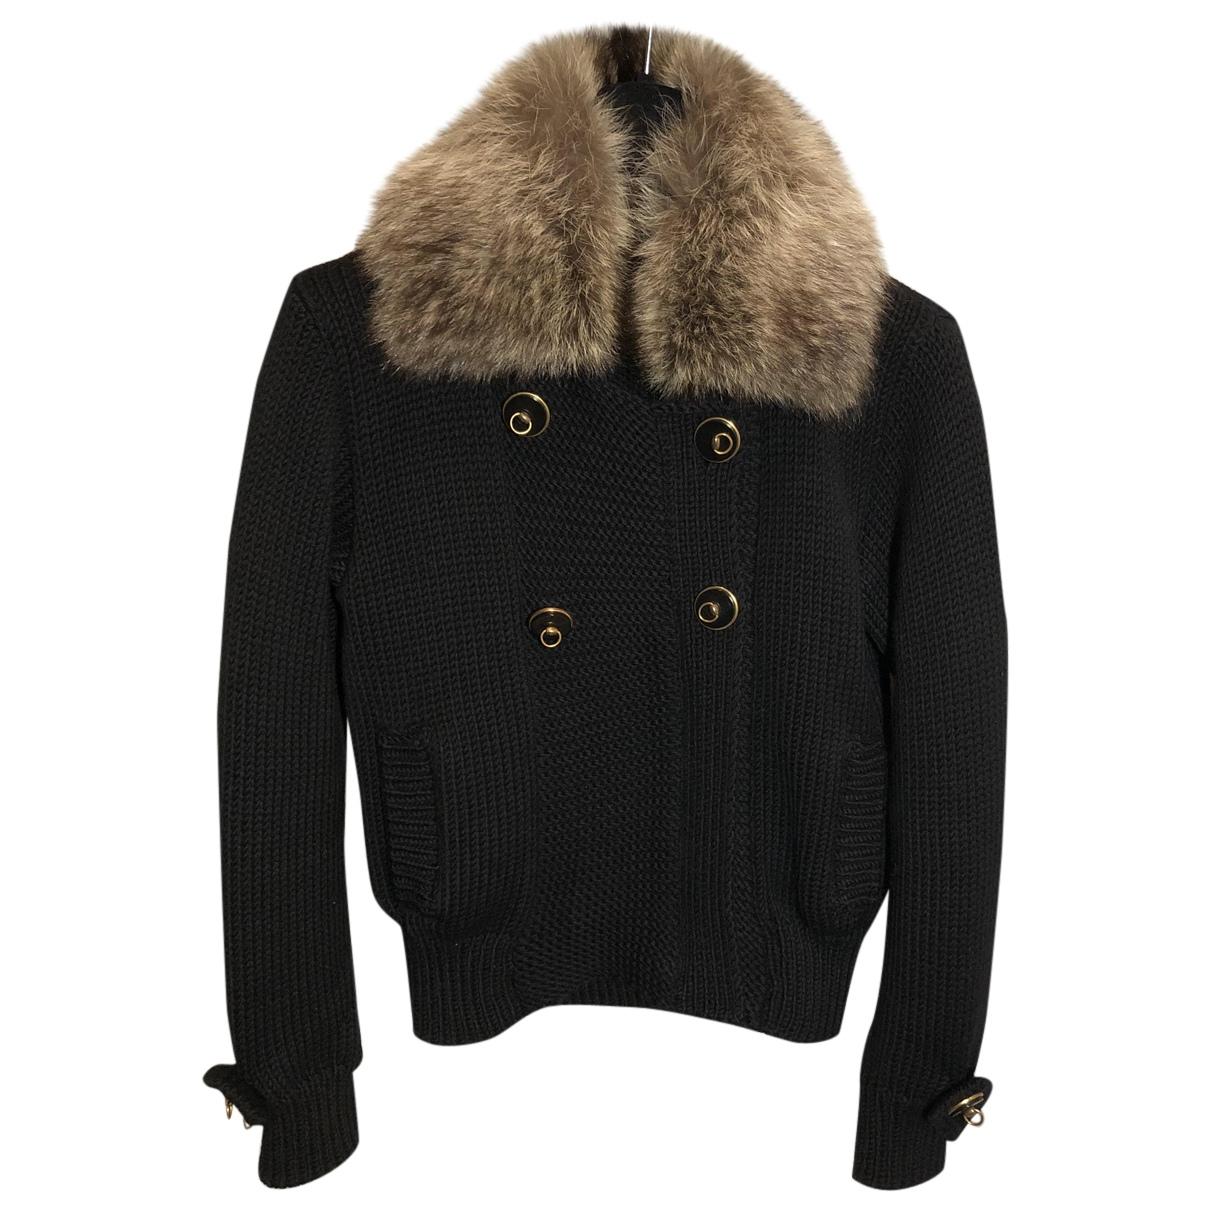 Gucci N Black Wool Knitwear for Women M International